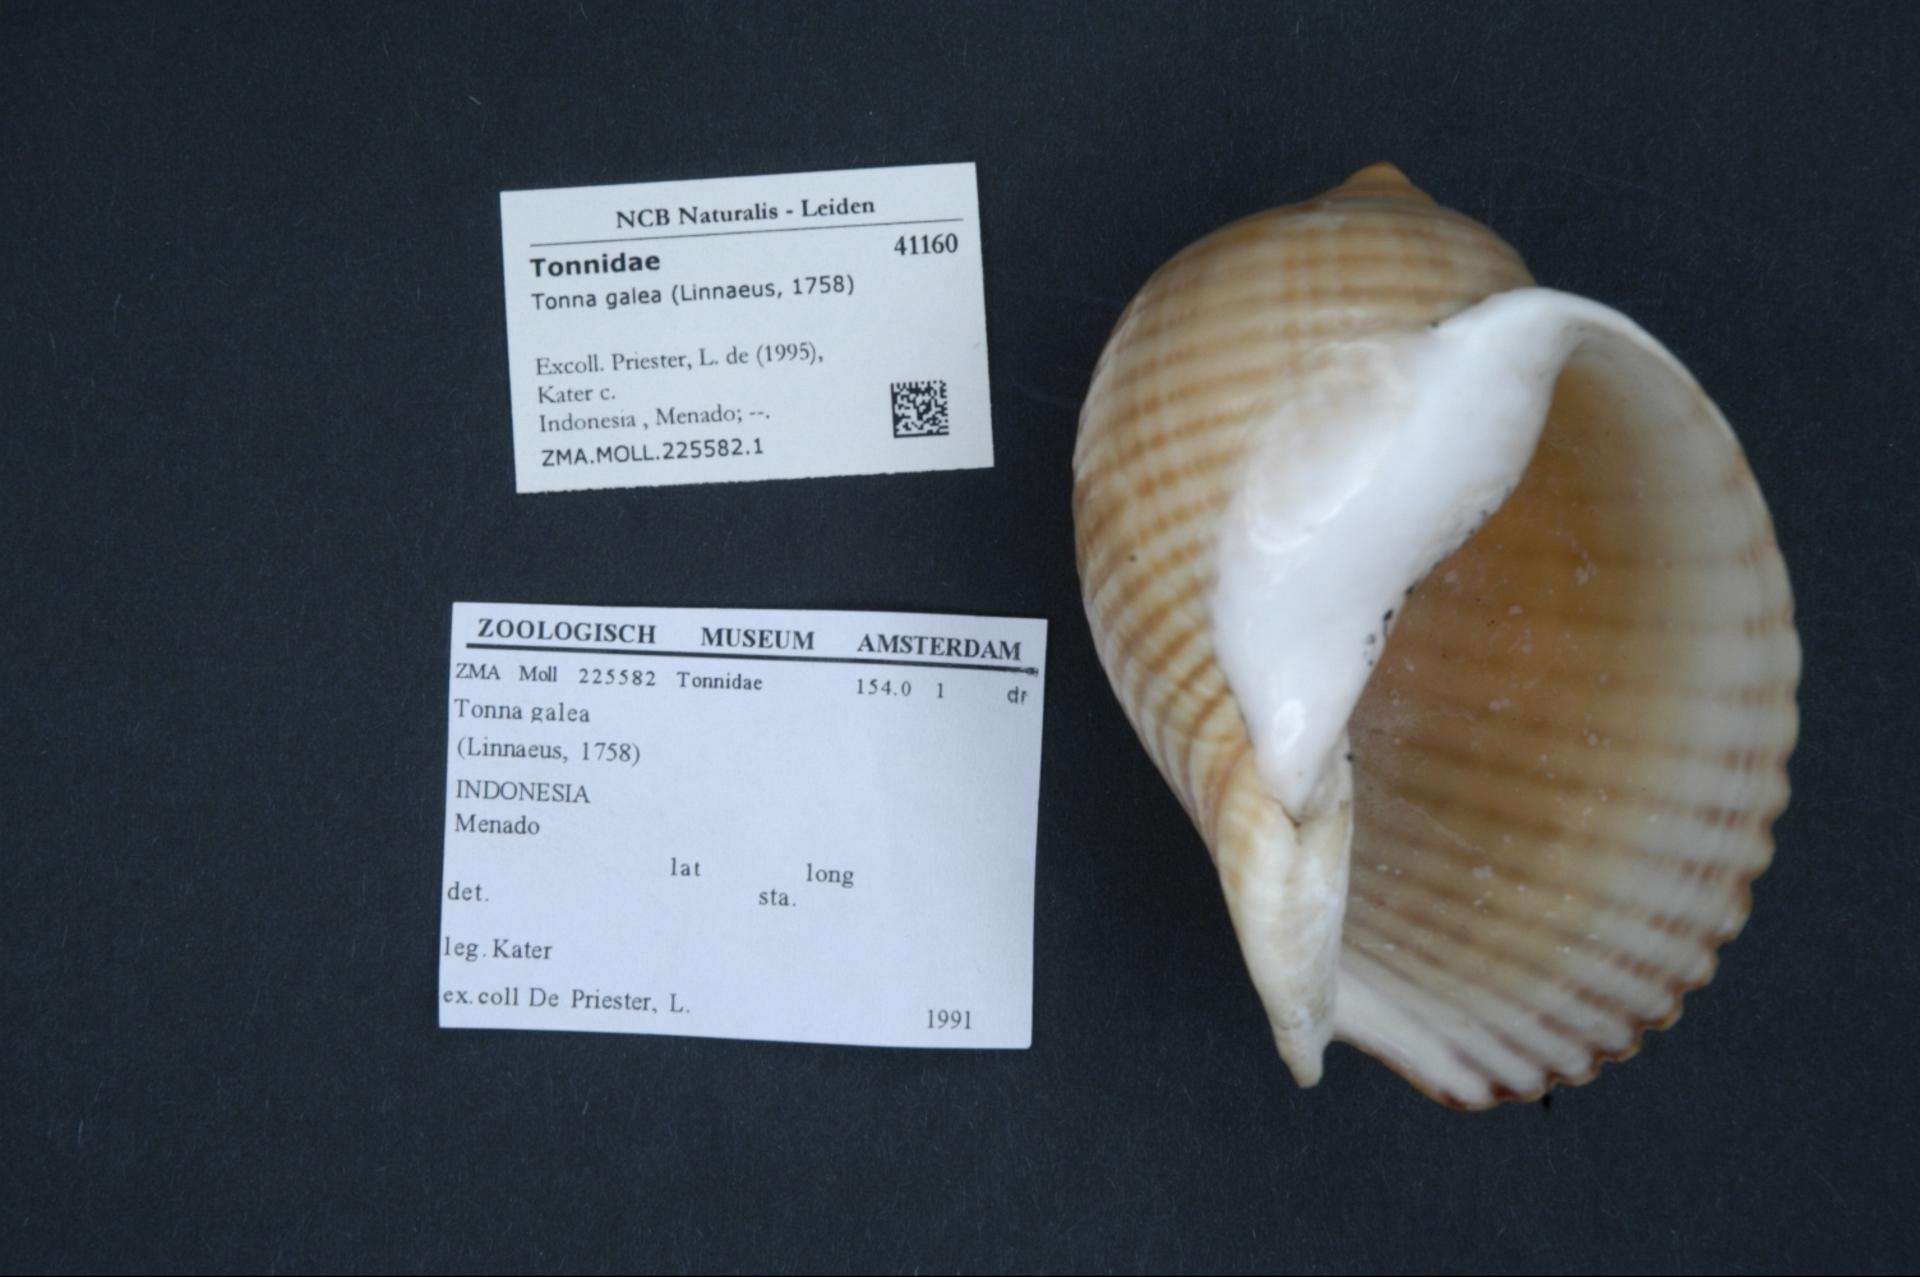 ZMA.MOLL.225582.1 | Tonna galea (Linnaeus, 1758)